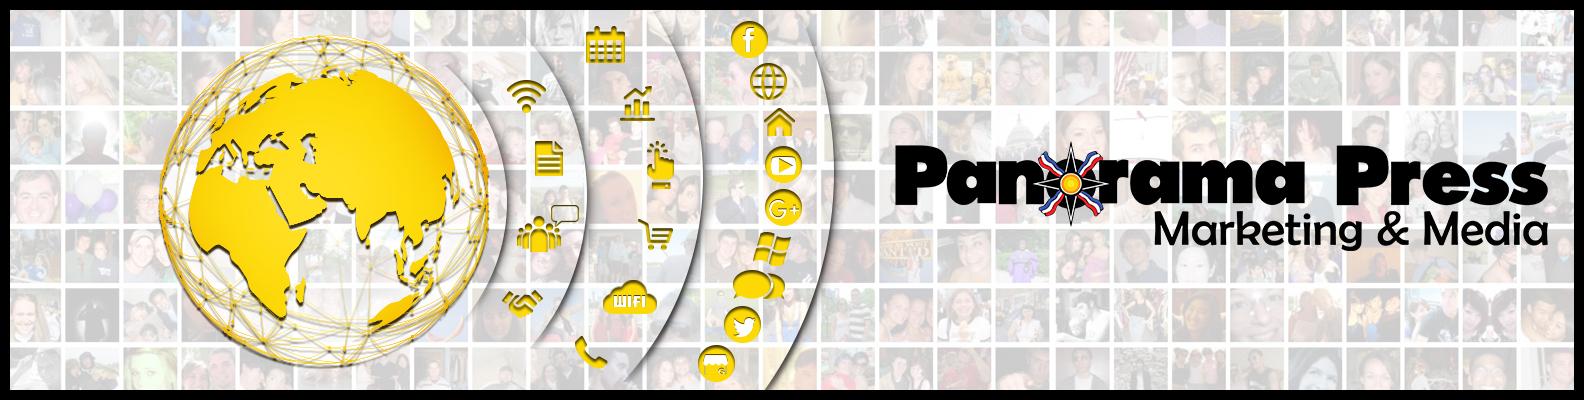 Panorama Press Marketing and Media